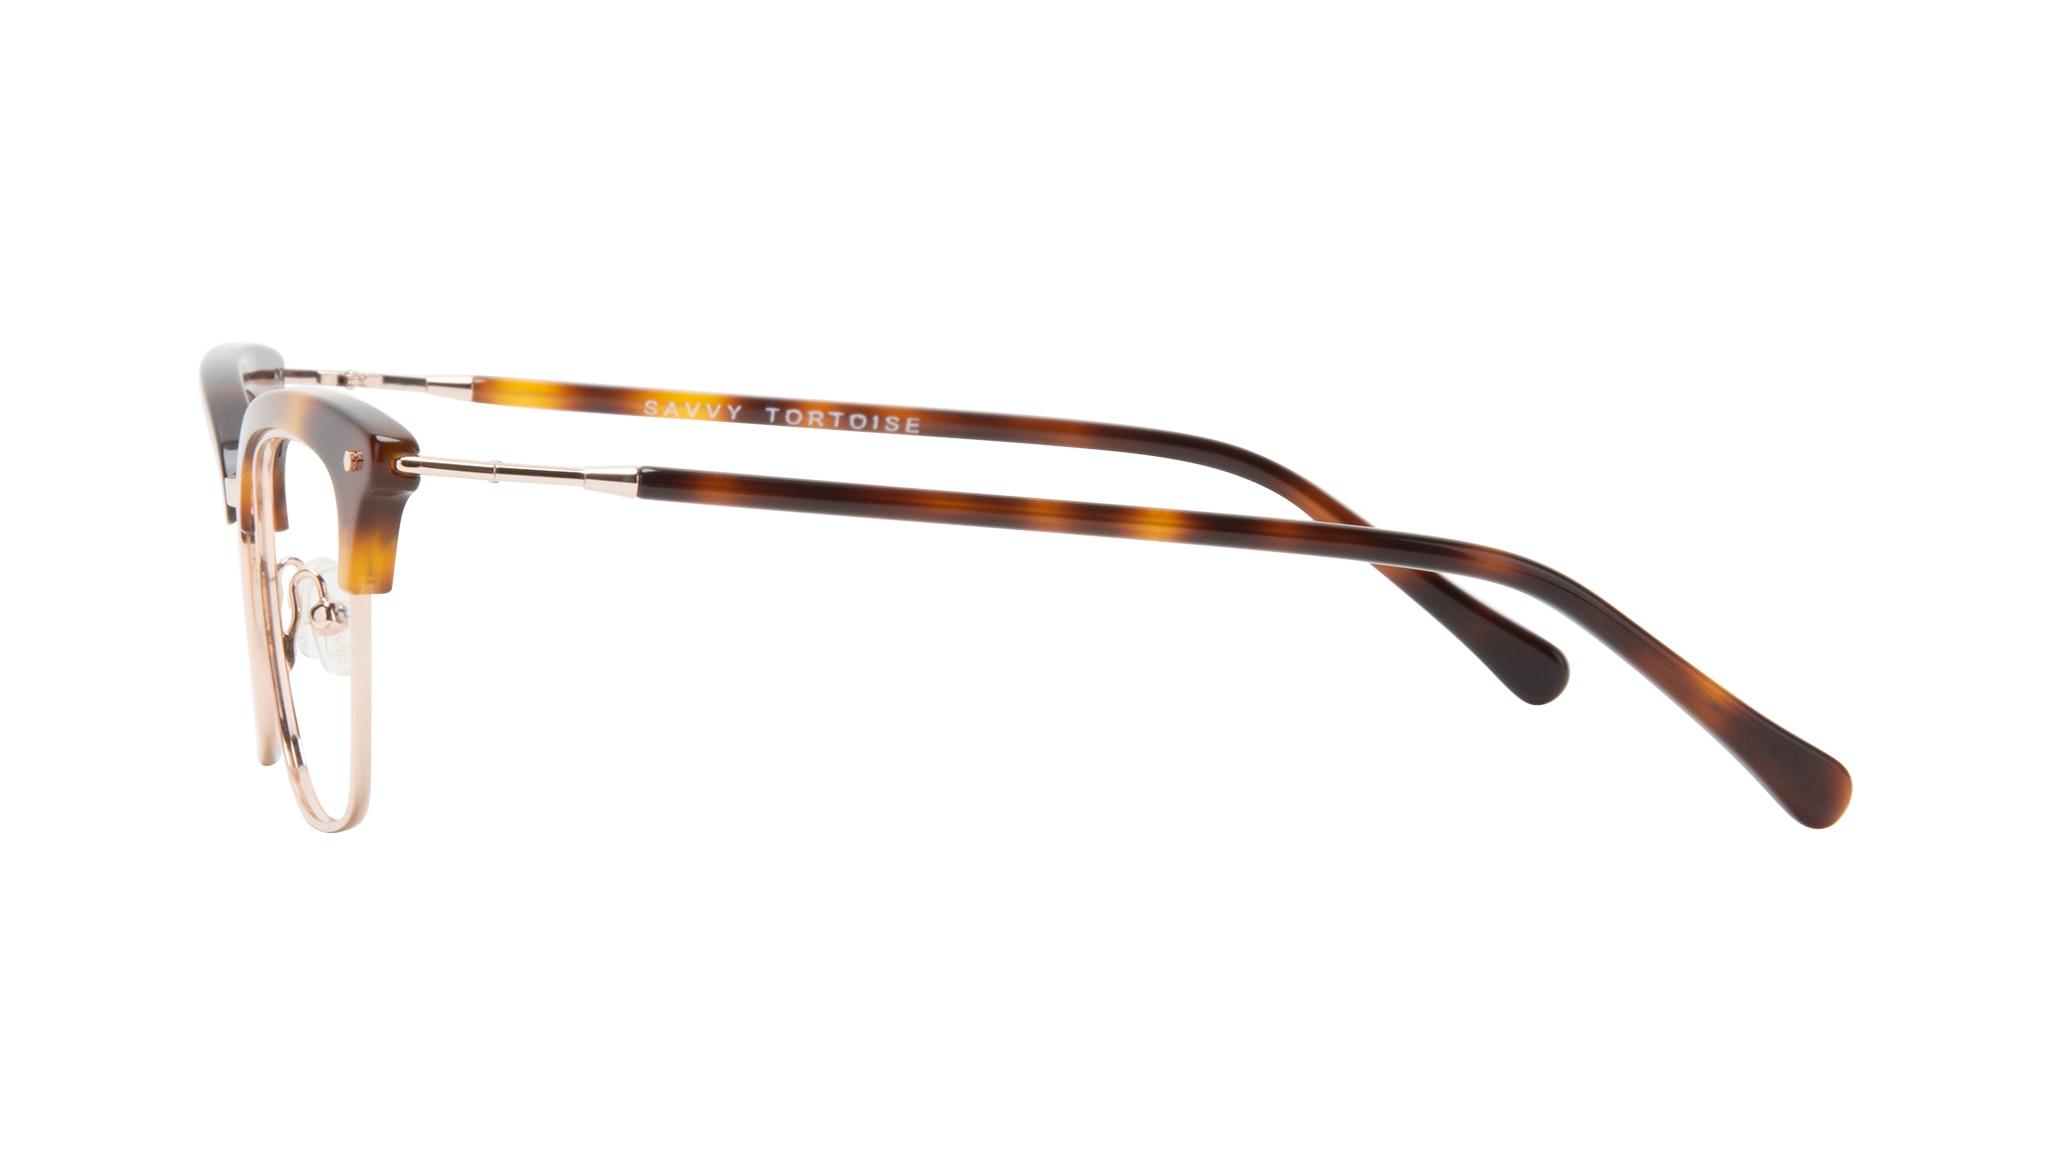 Affordable Fashion Glasses Cat Eye Eyeglasses Women Savvy Tortoise Side